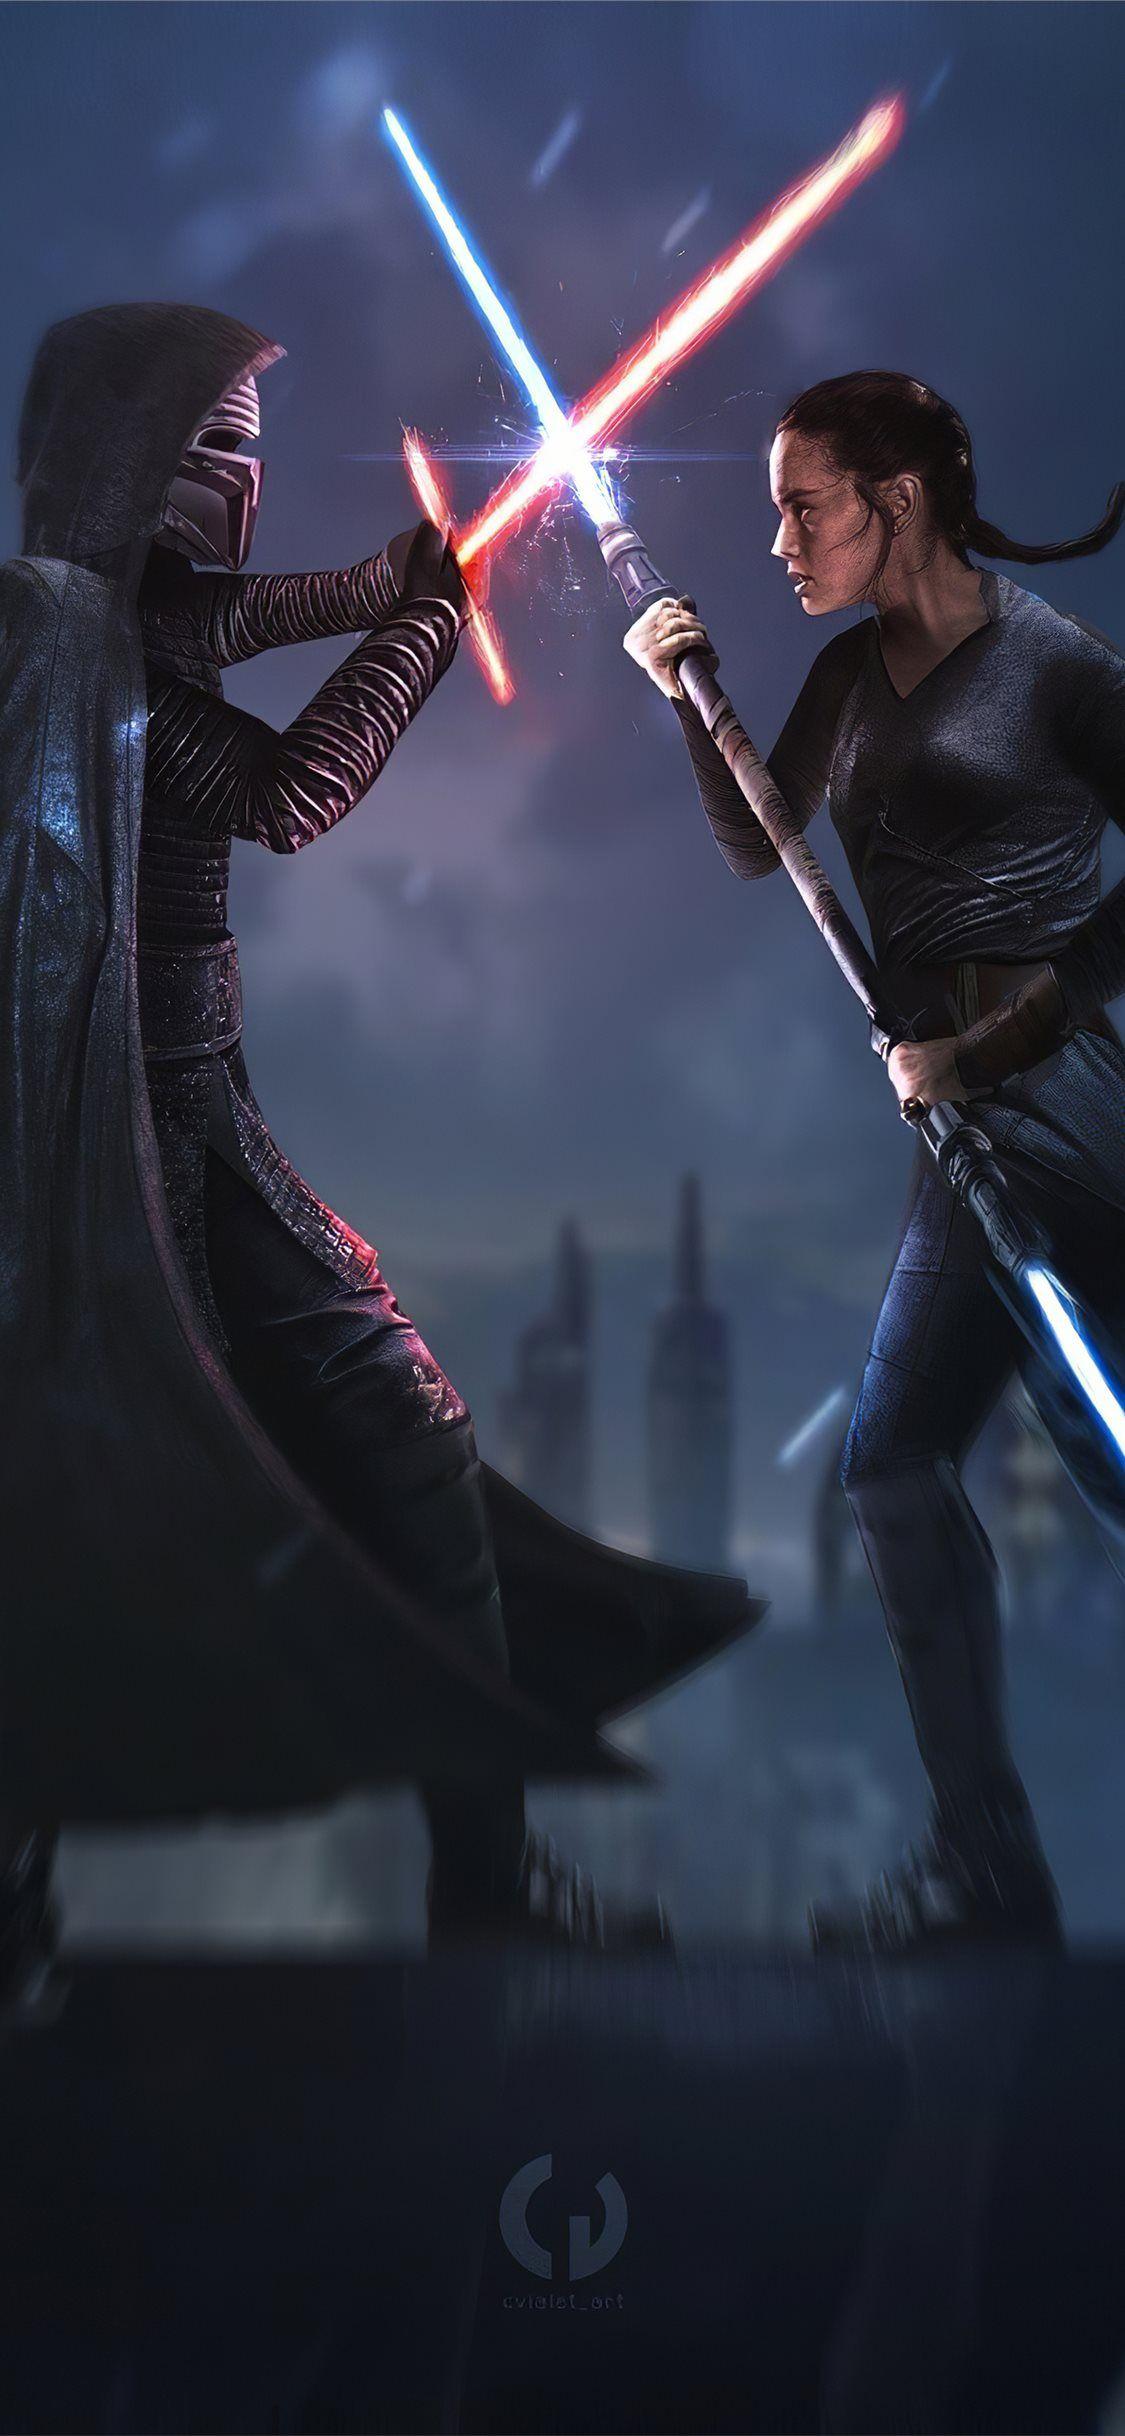 Star Wars Ix Duel Of Fates 4k Starwars Rey Movies Artist Artwork Digitalart 4k Iphone11wallpaper Star Wars Star Wars Art Movie Wallpapers